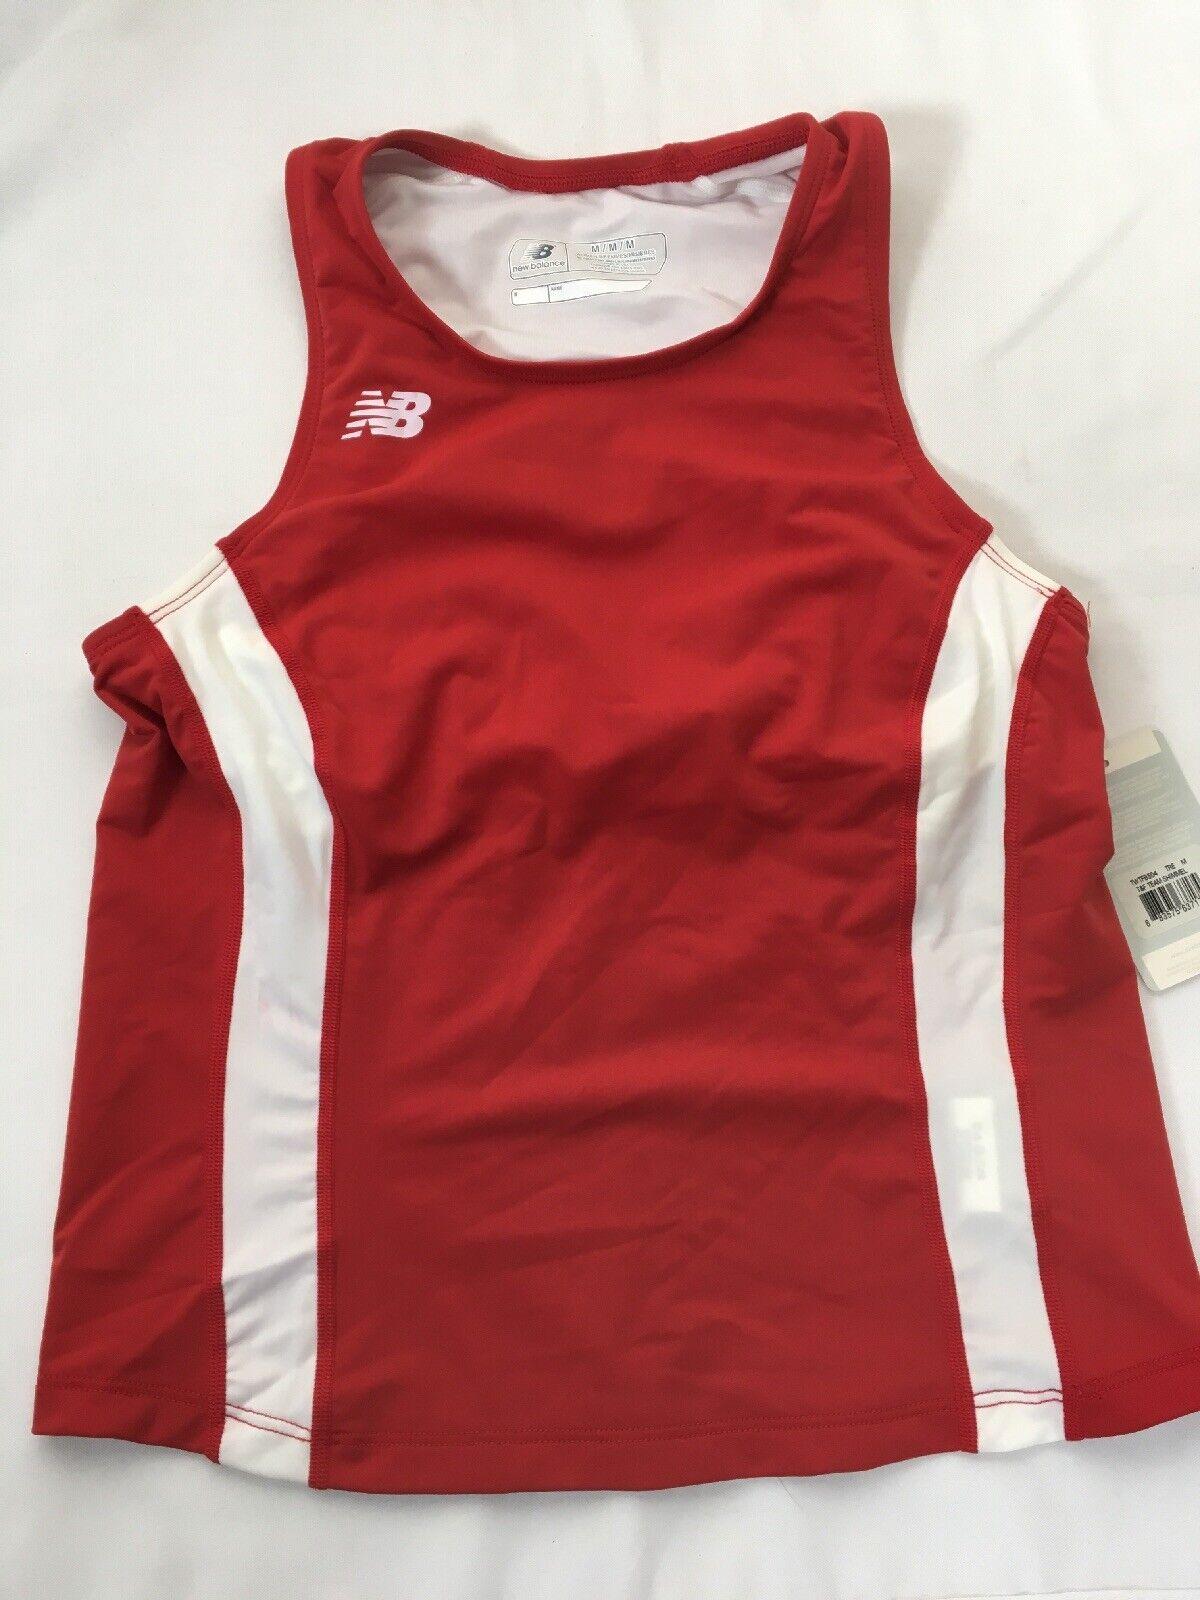 NEW BALANCE Women's Red White Track & Field Team Tank Top TWTFB504 MEDIUM NWT